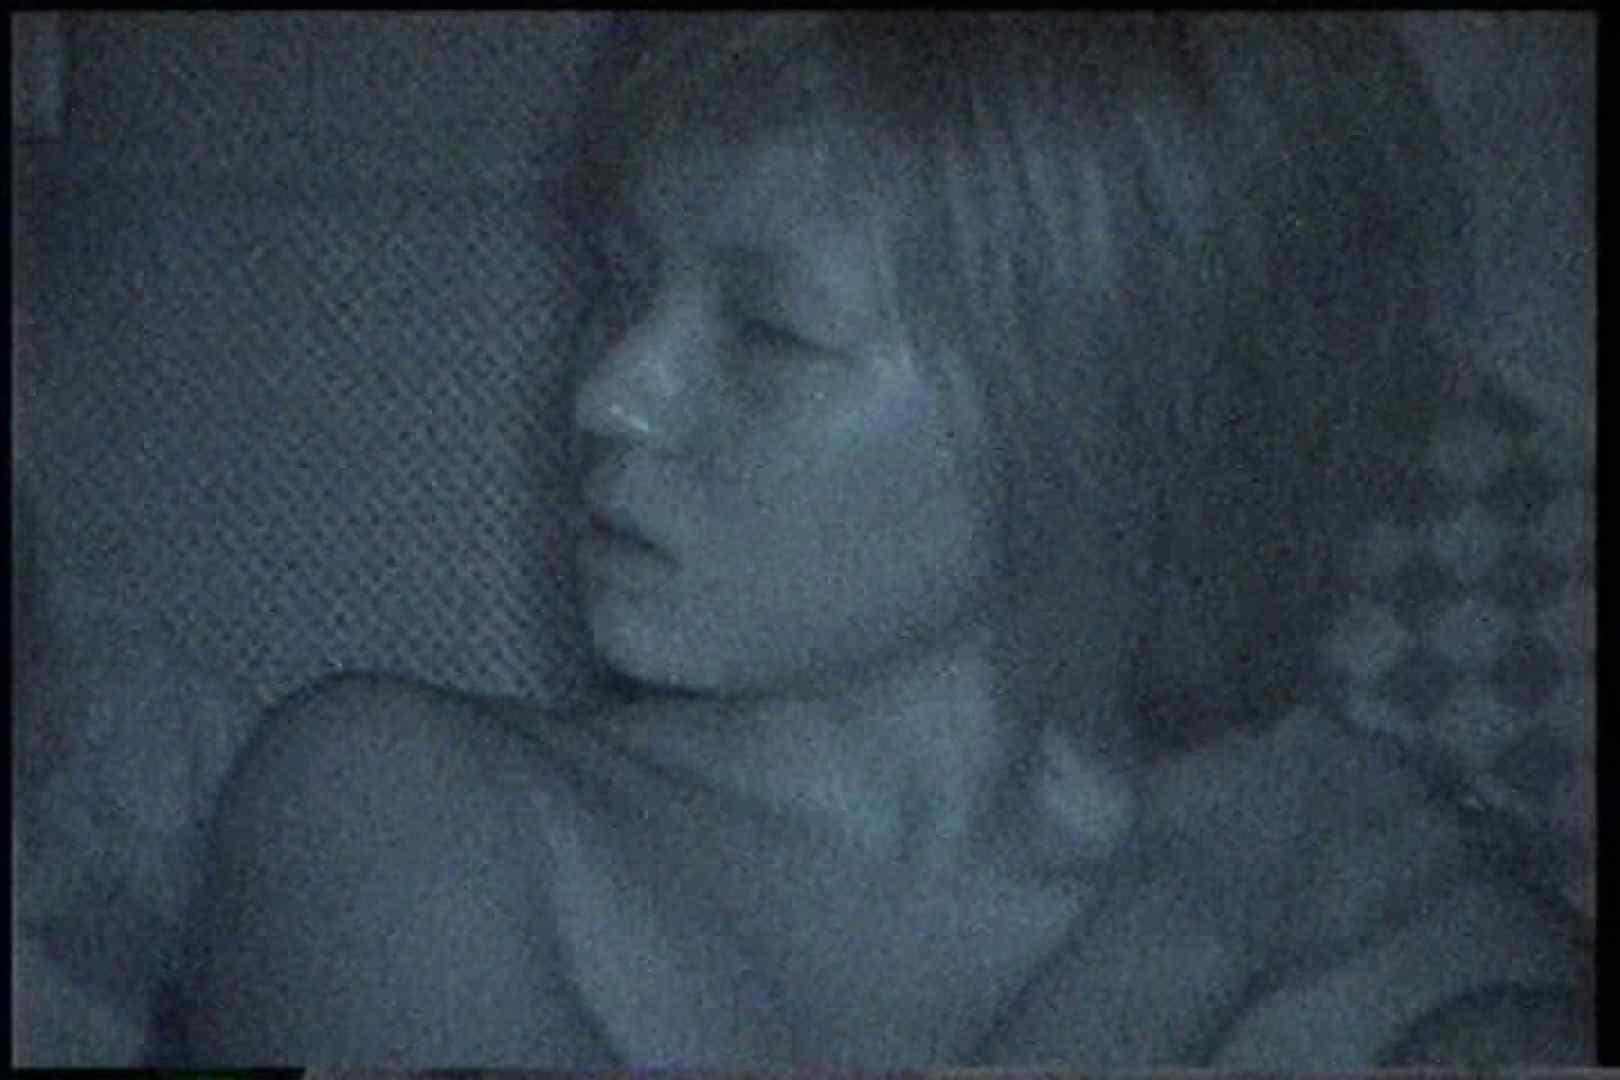 充血監督の深夜の運動会Vol.169 美女OL エロ無料画像 62連発 18